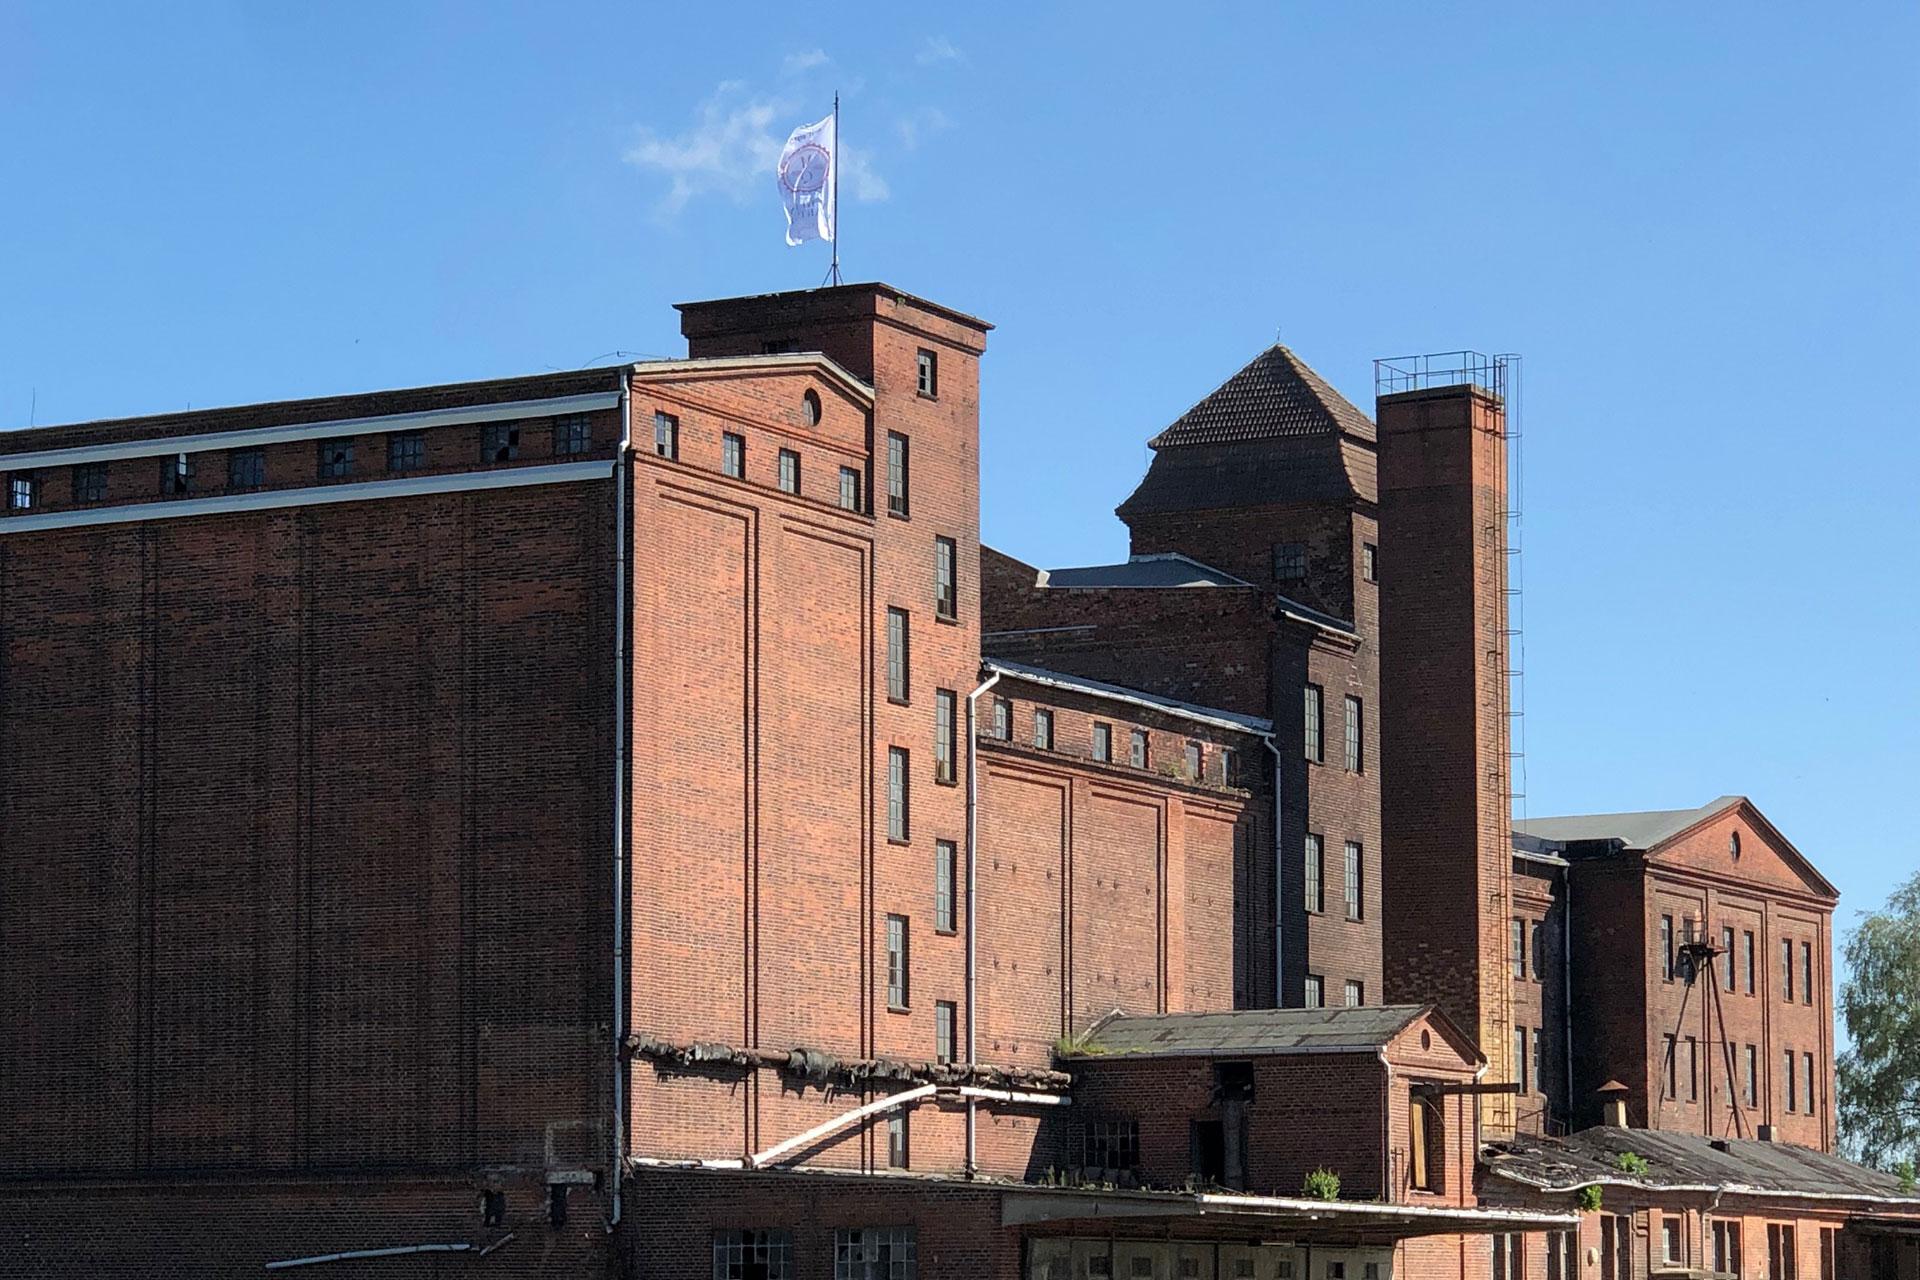 Mühlenquartier